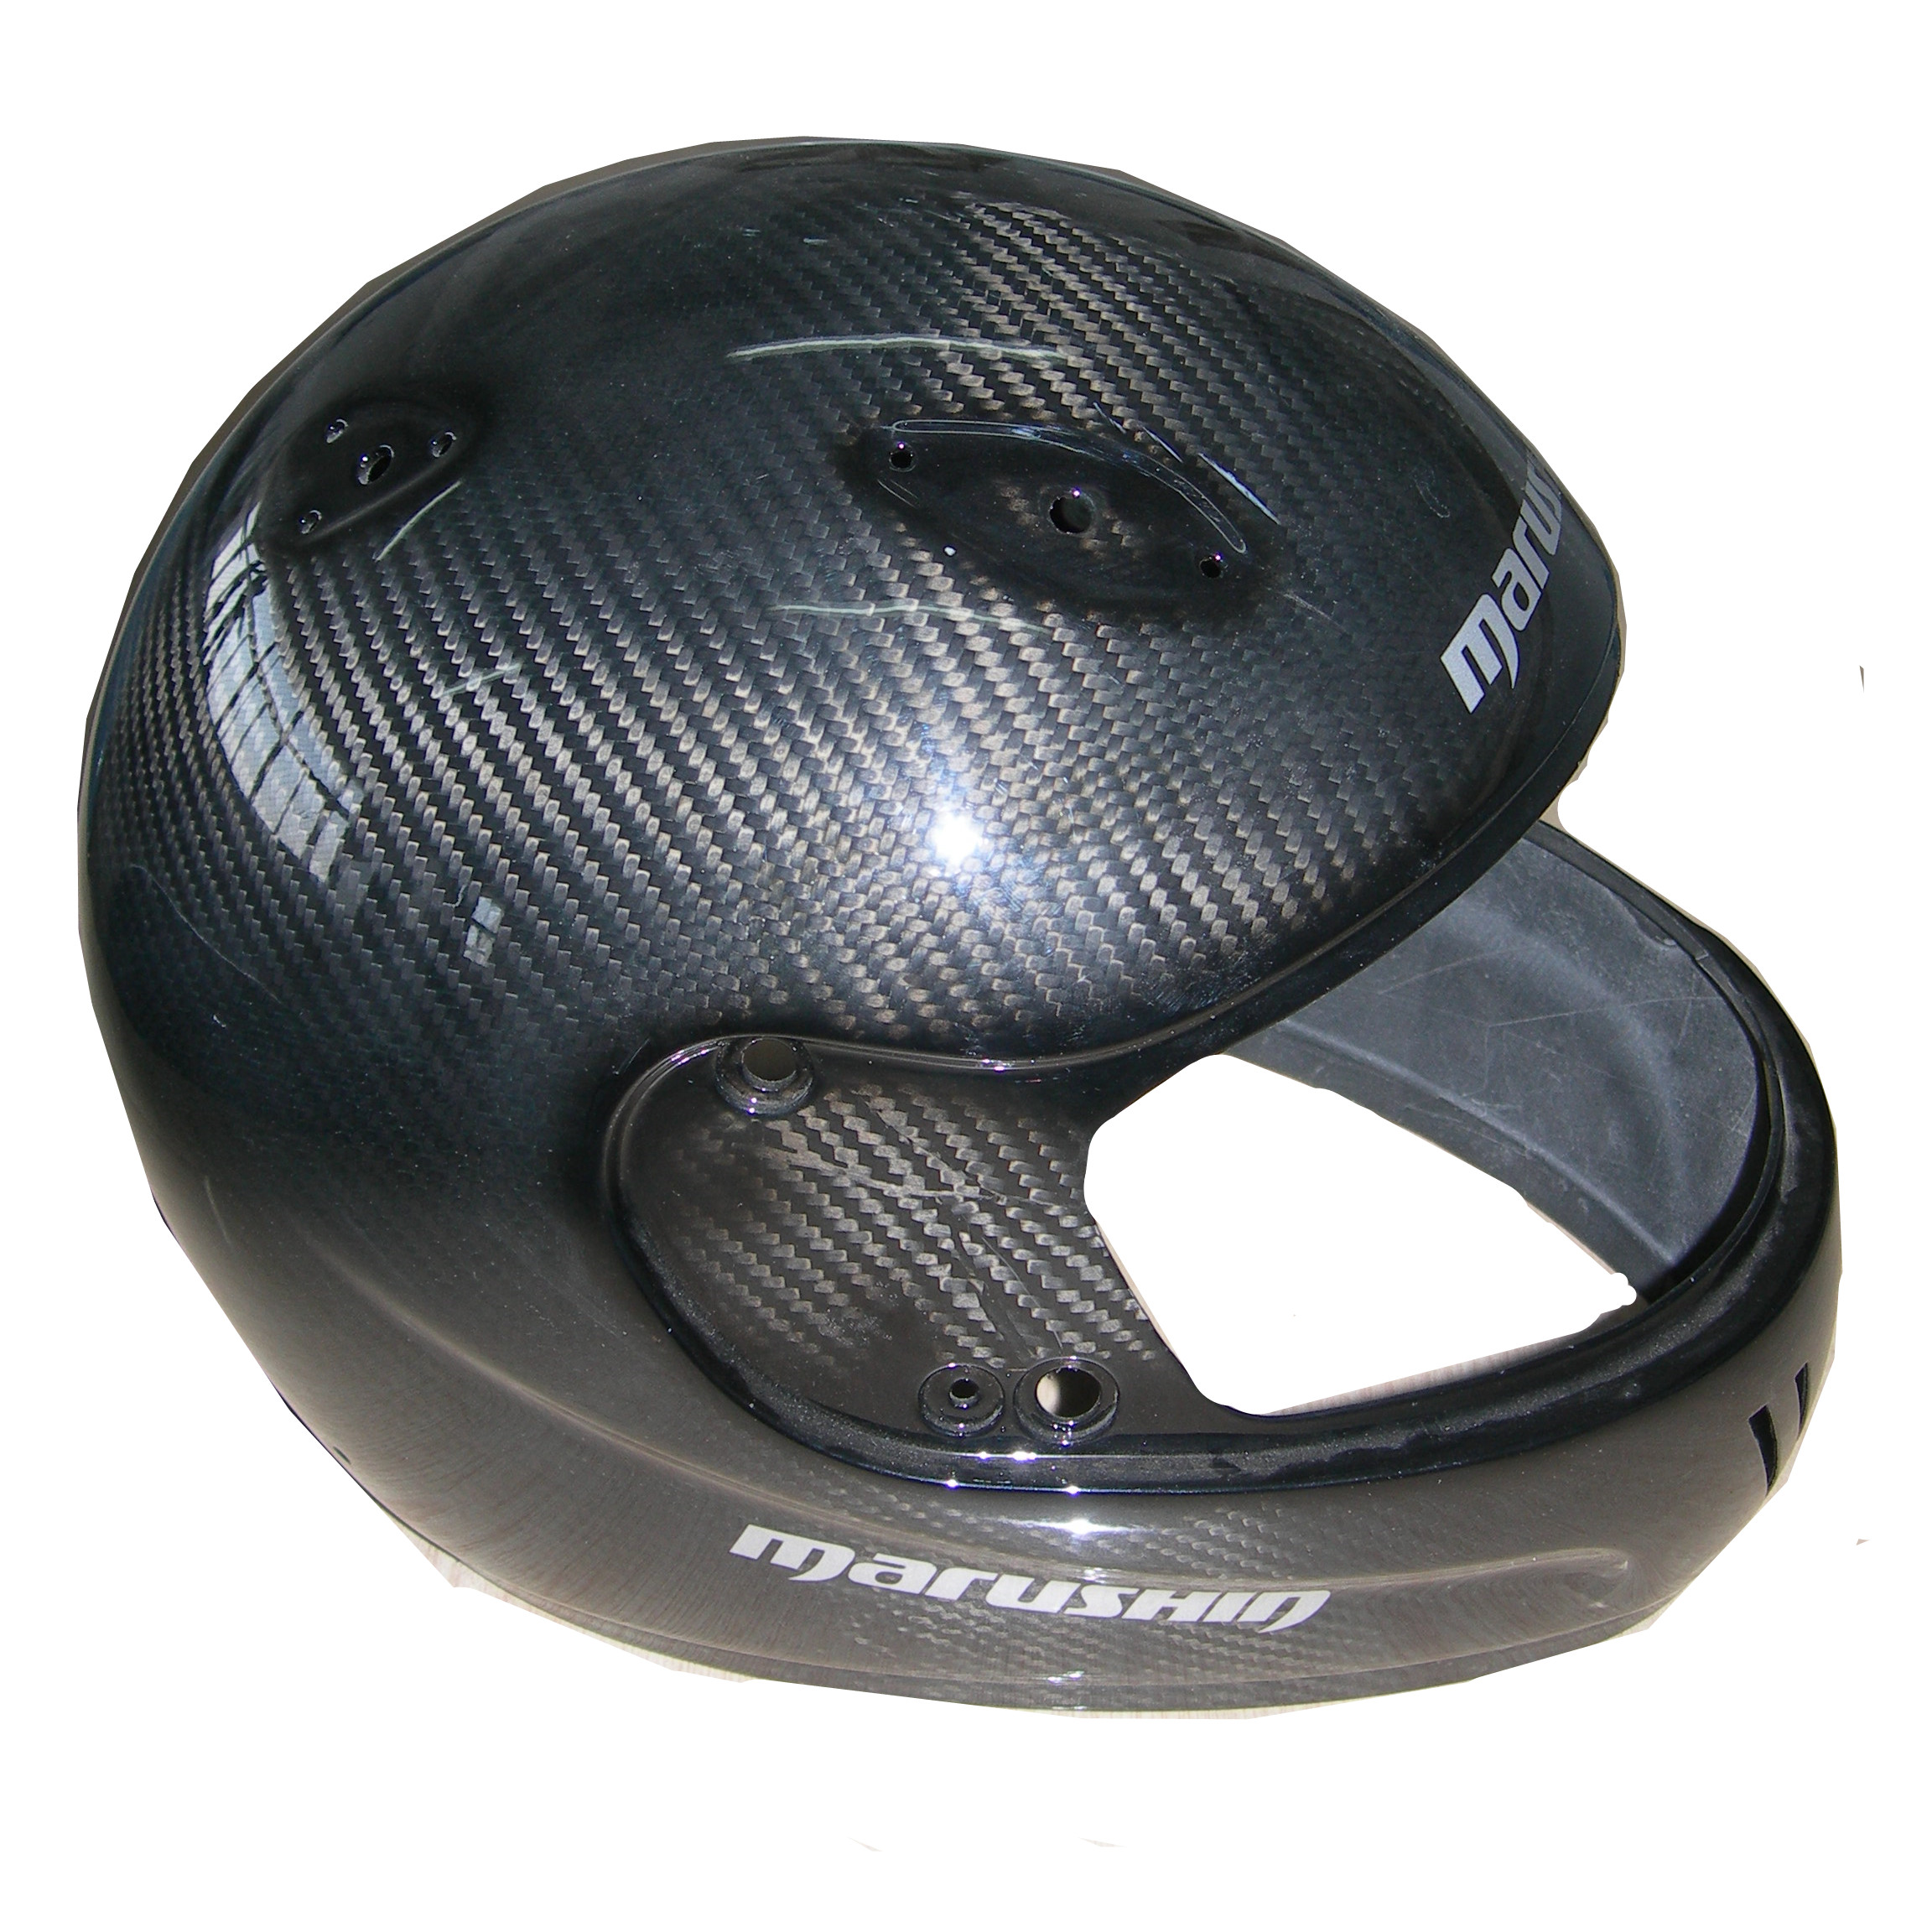 Customized carbon fiber helmet